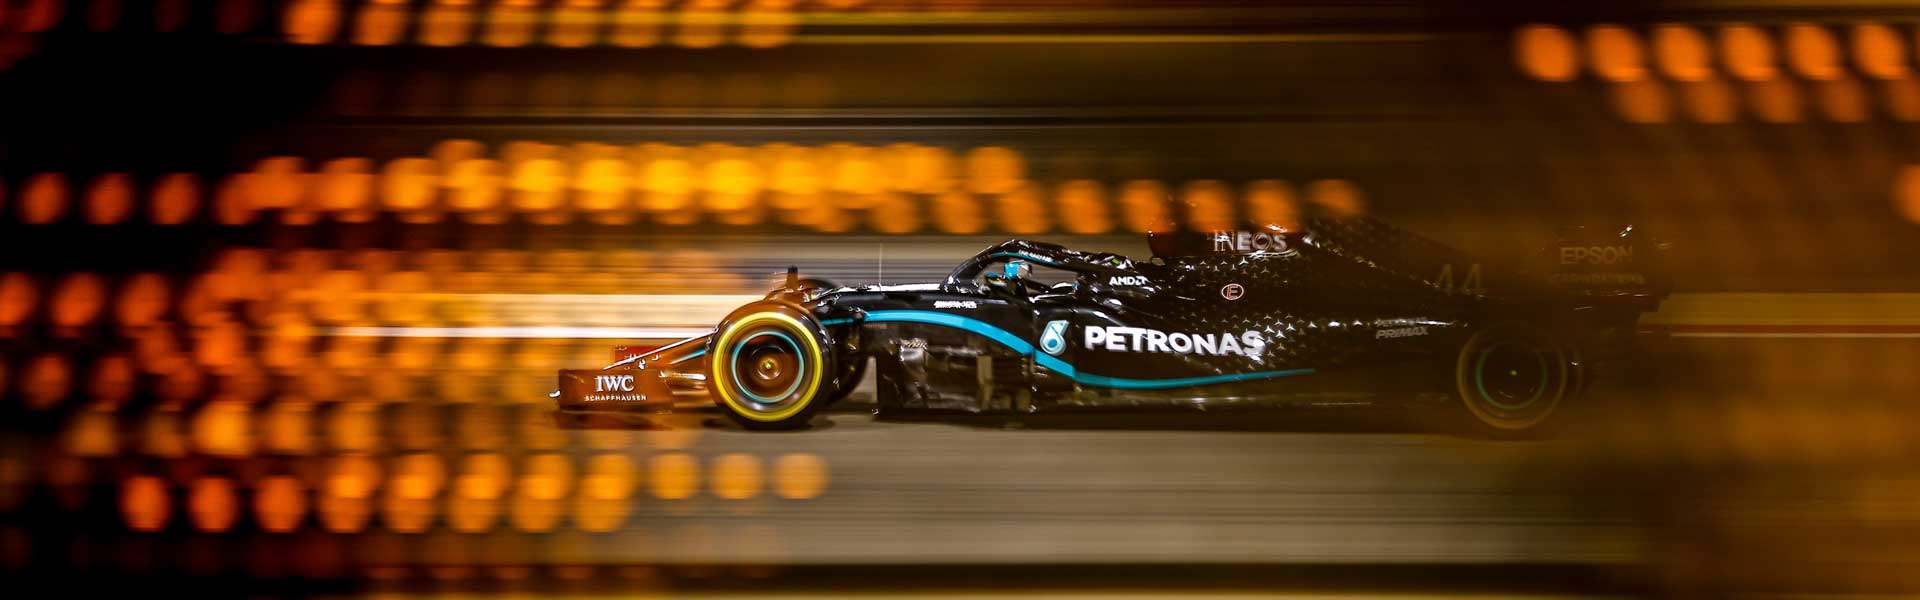 Lewis Hamilton wins a hard and shocking Bahrain GP